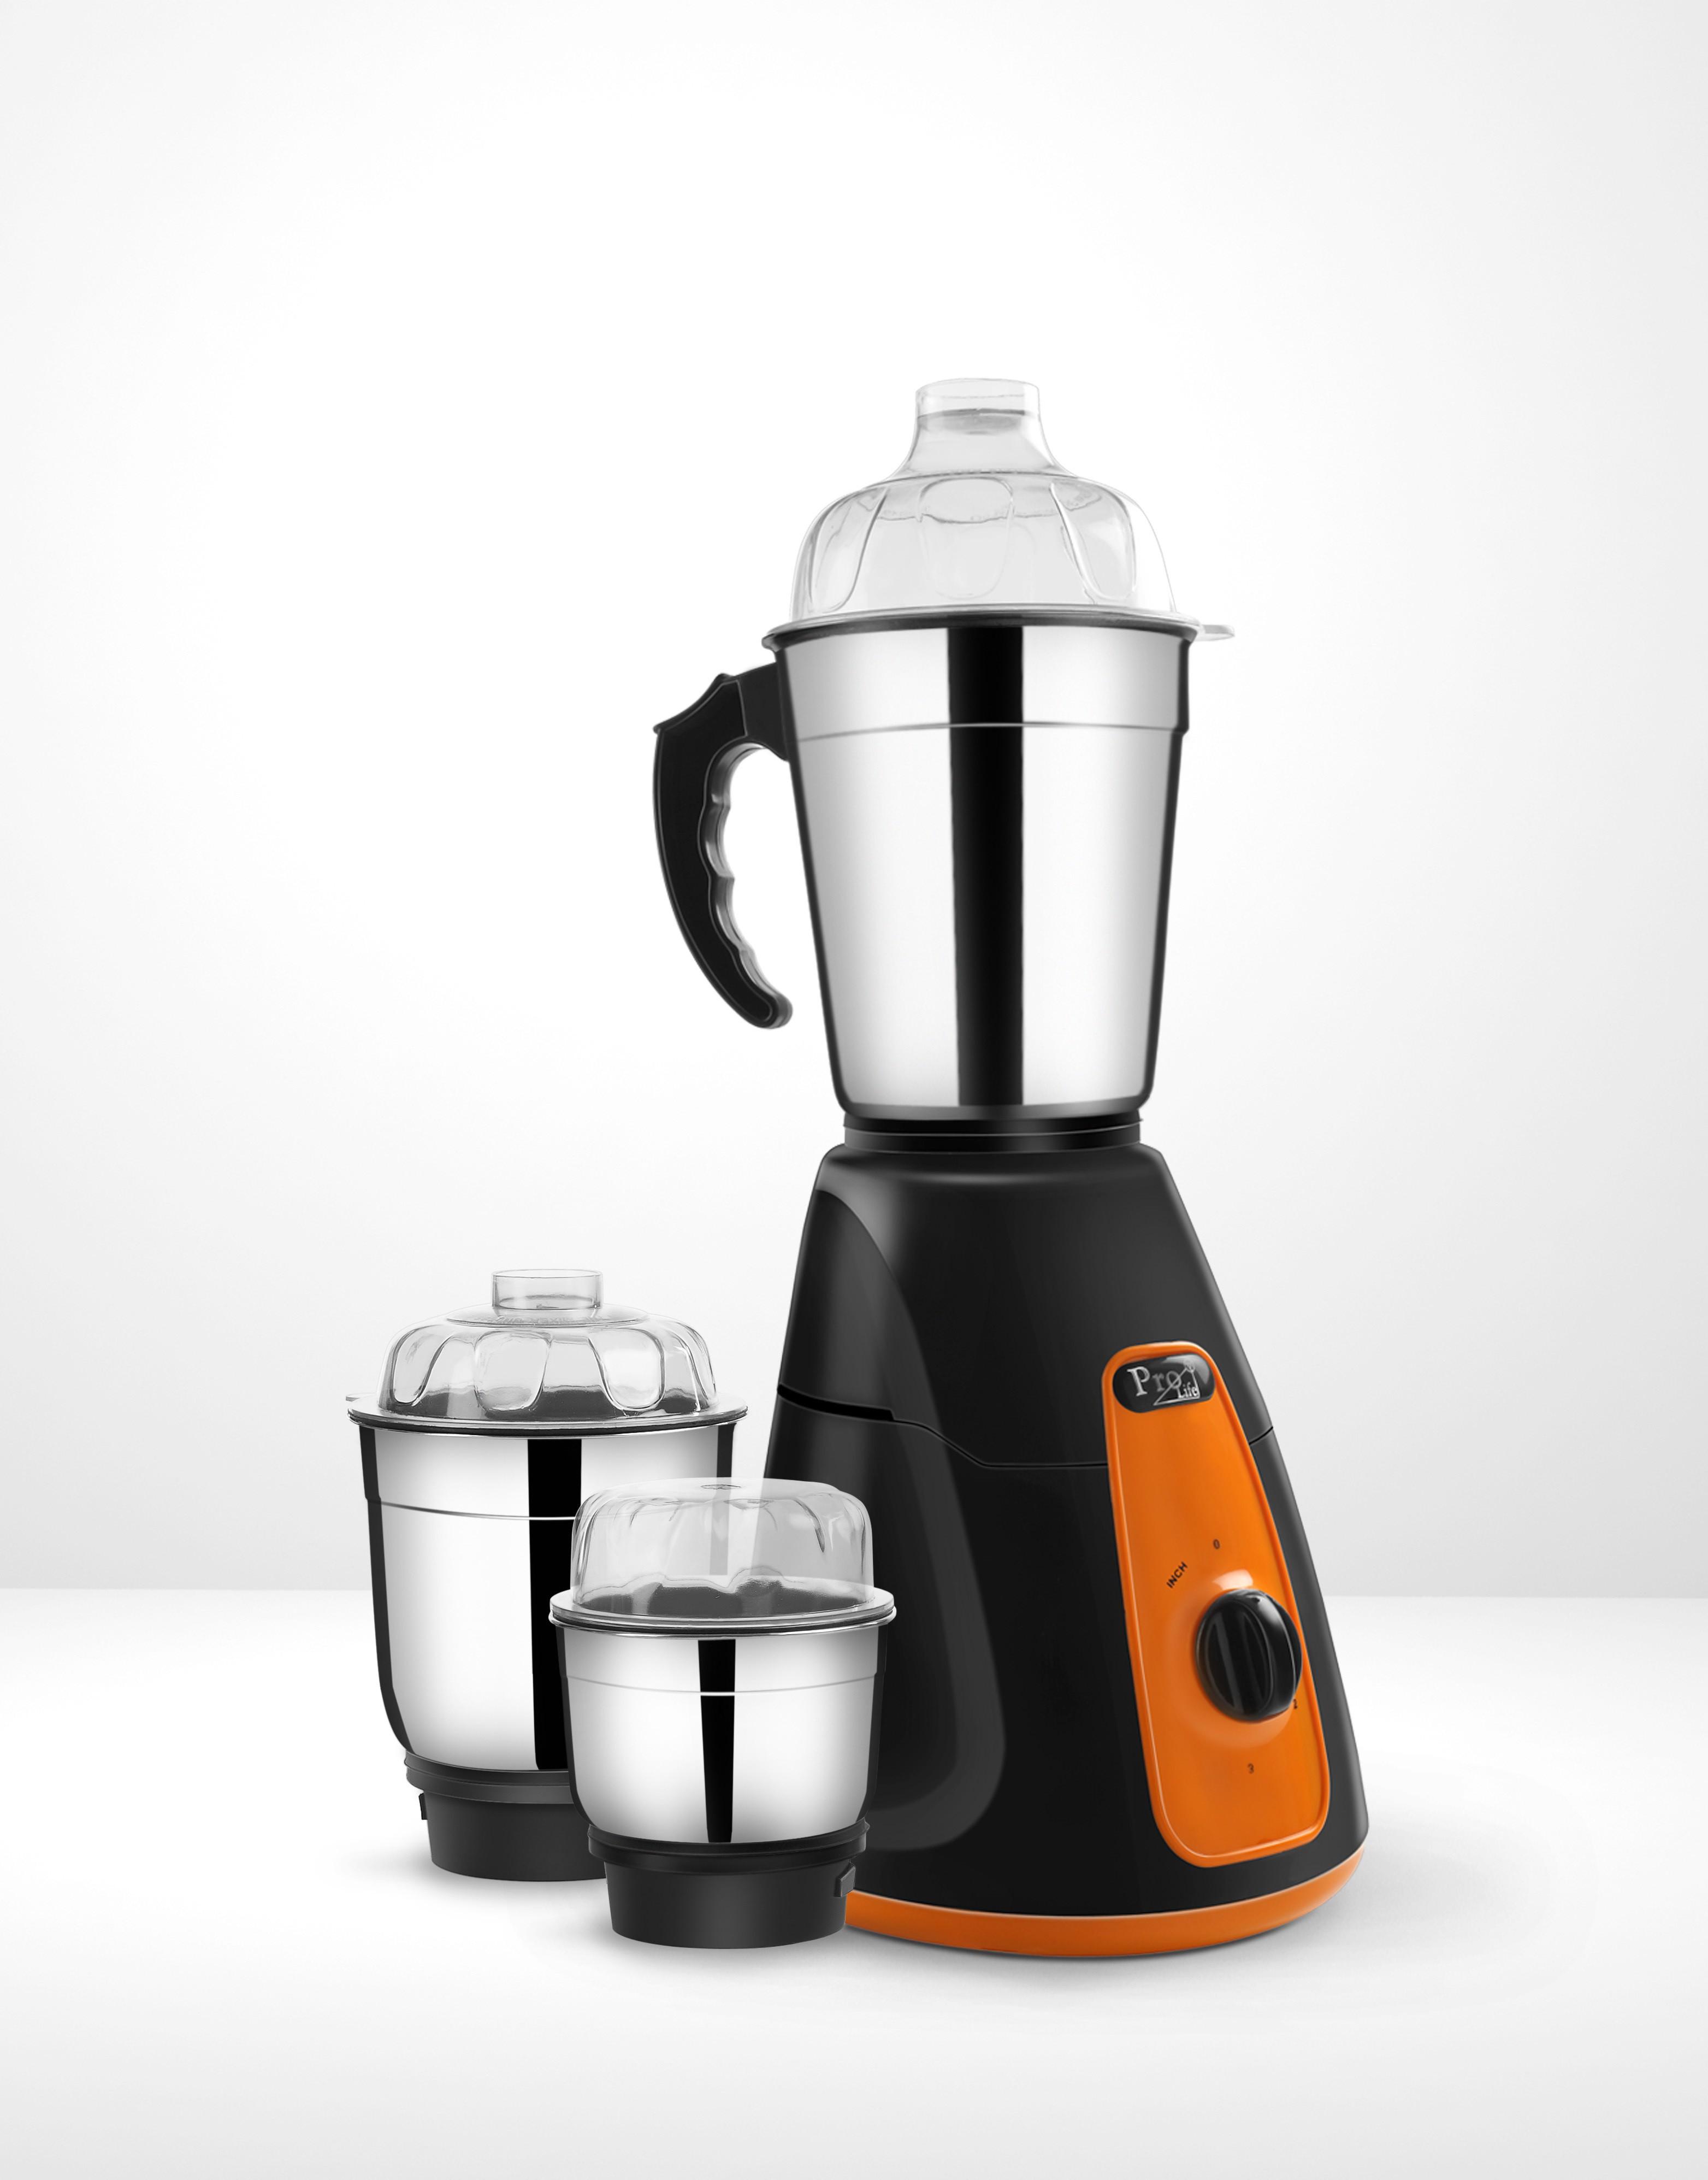 Prolife Jazz Pro 450 W Mixer Grinder(Black, Orange, 2 Jars)